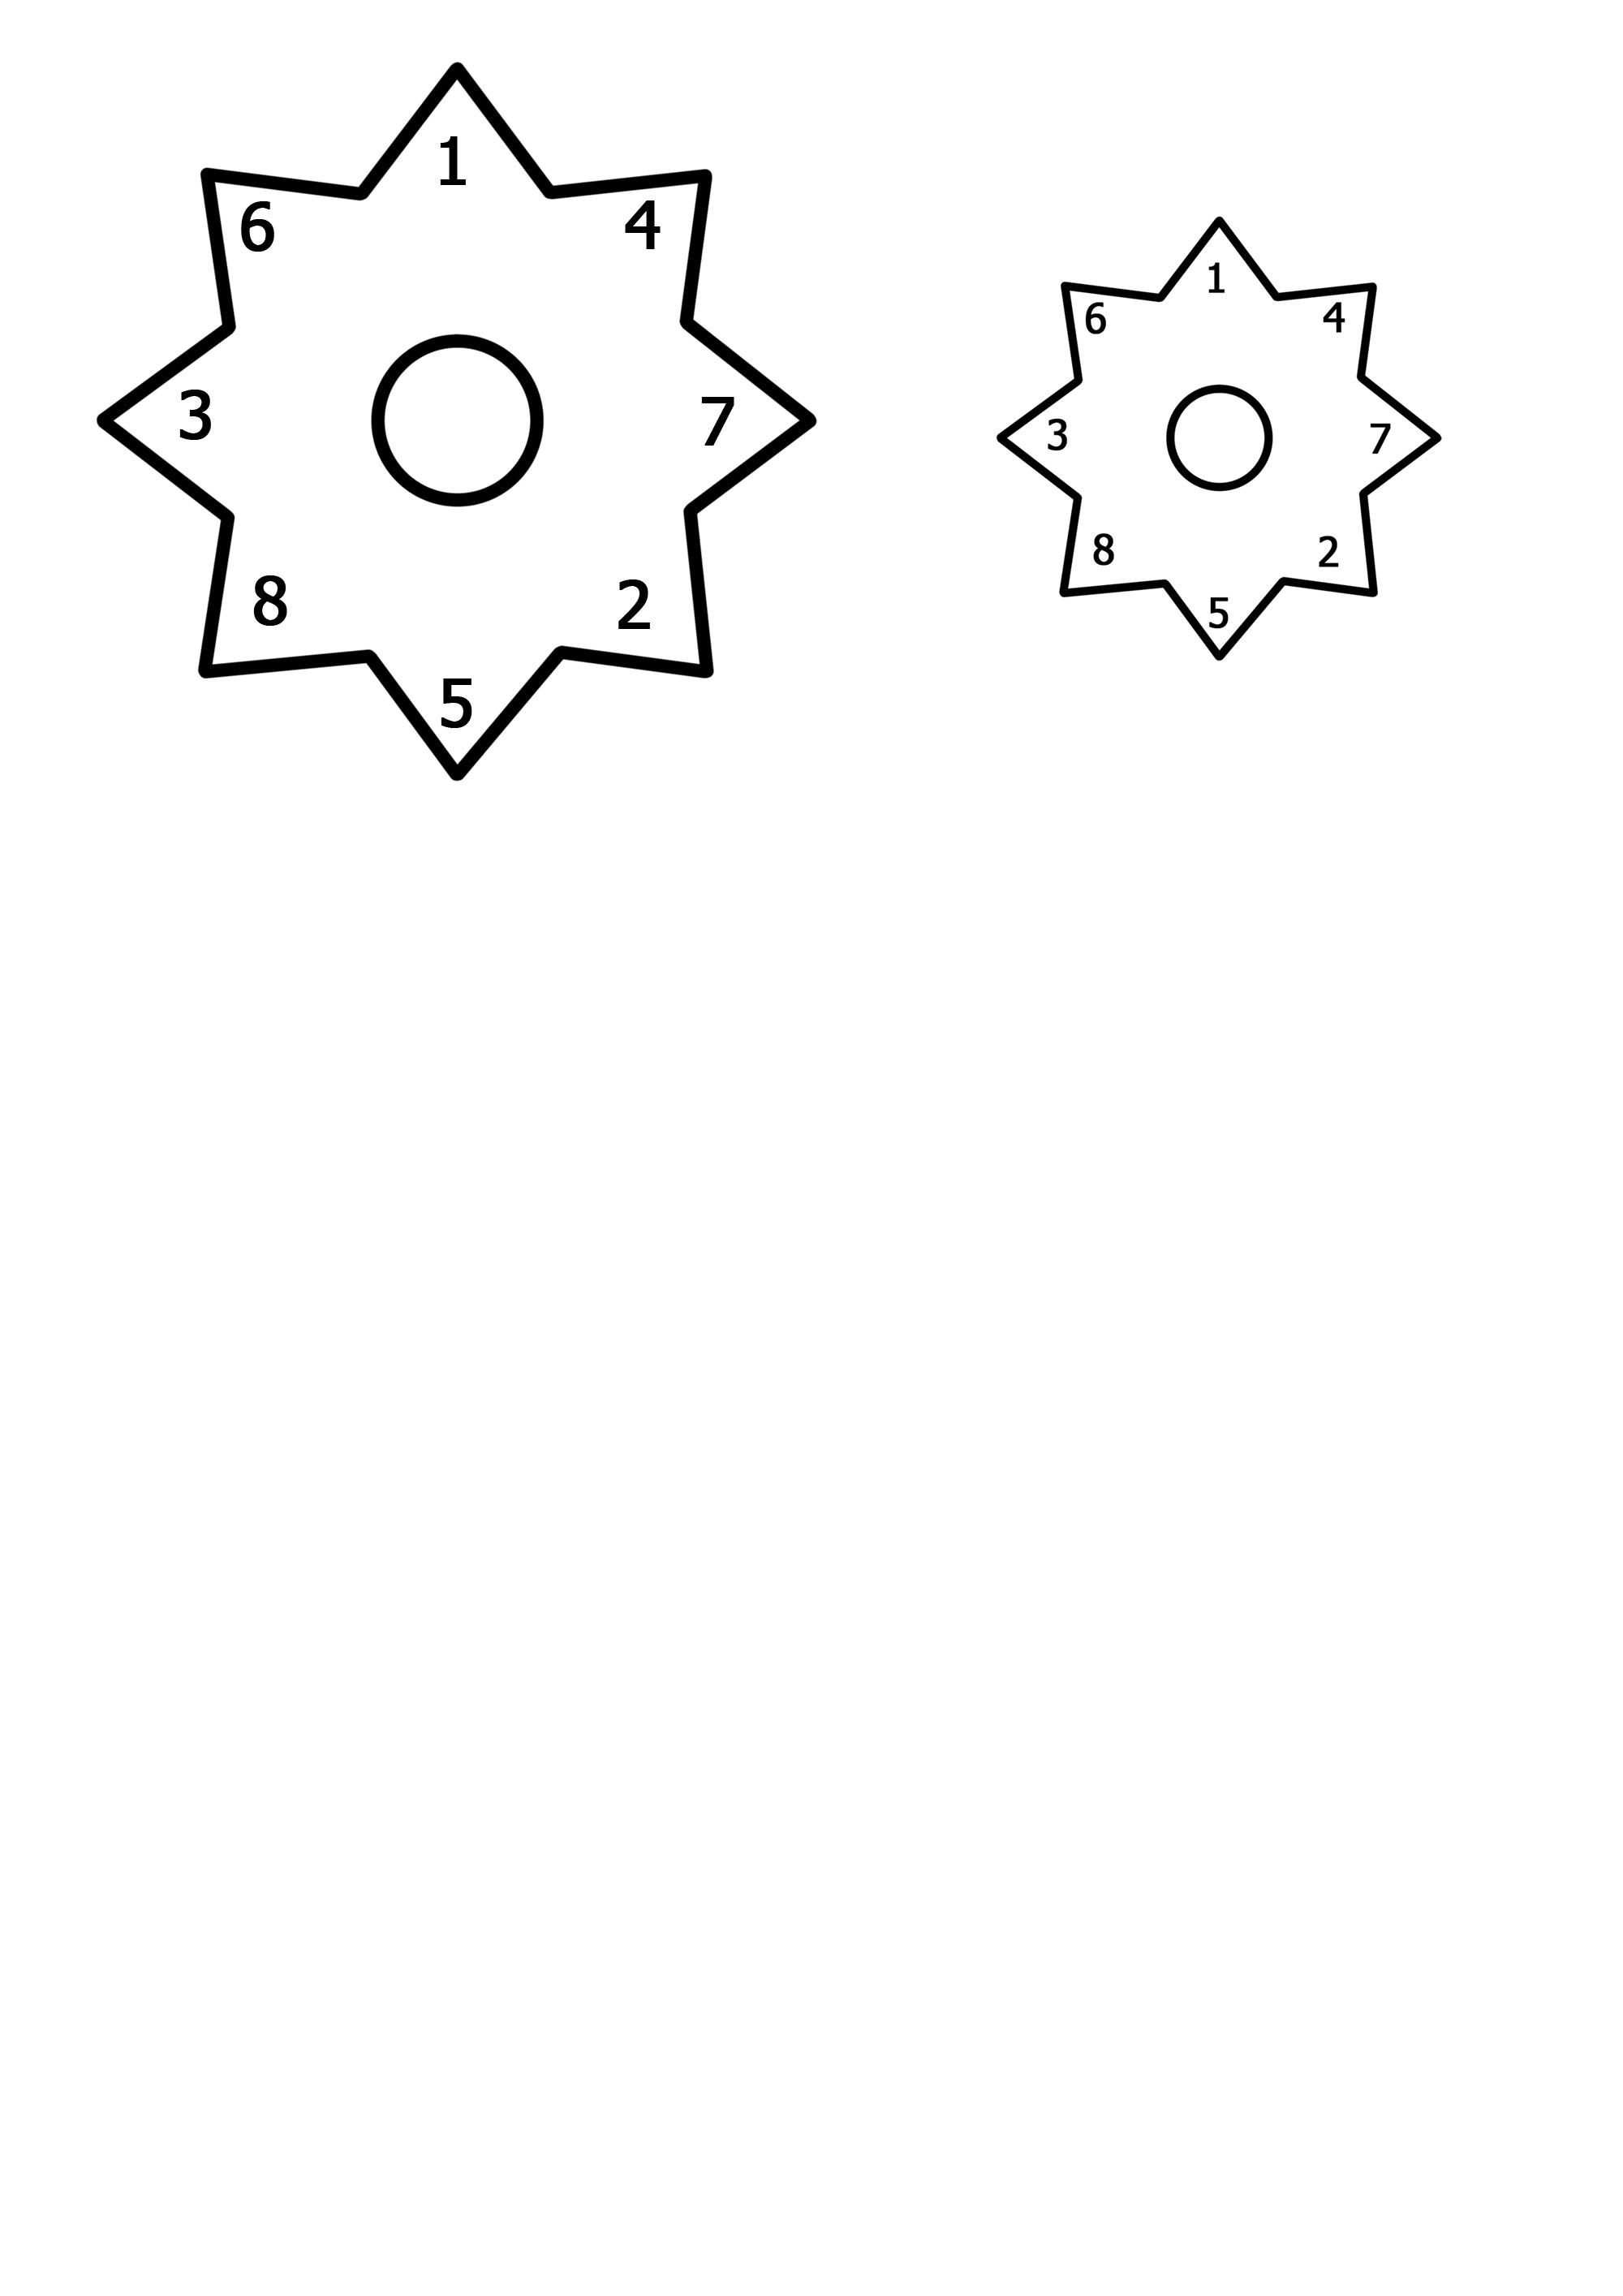 Шаблон звездочка для бантиков своими руками 27